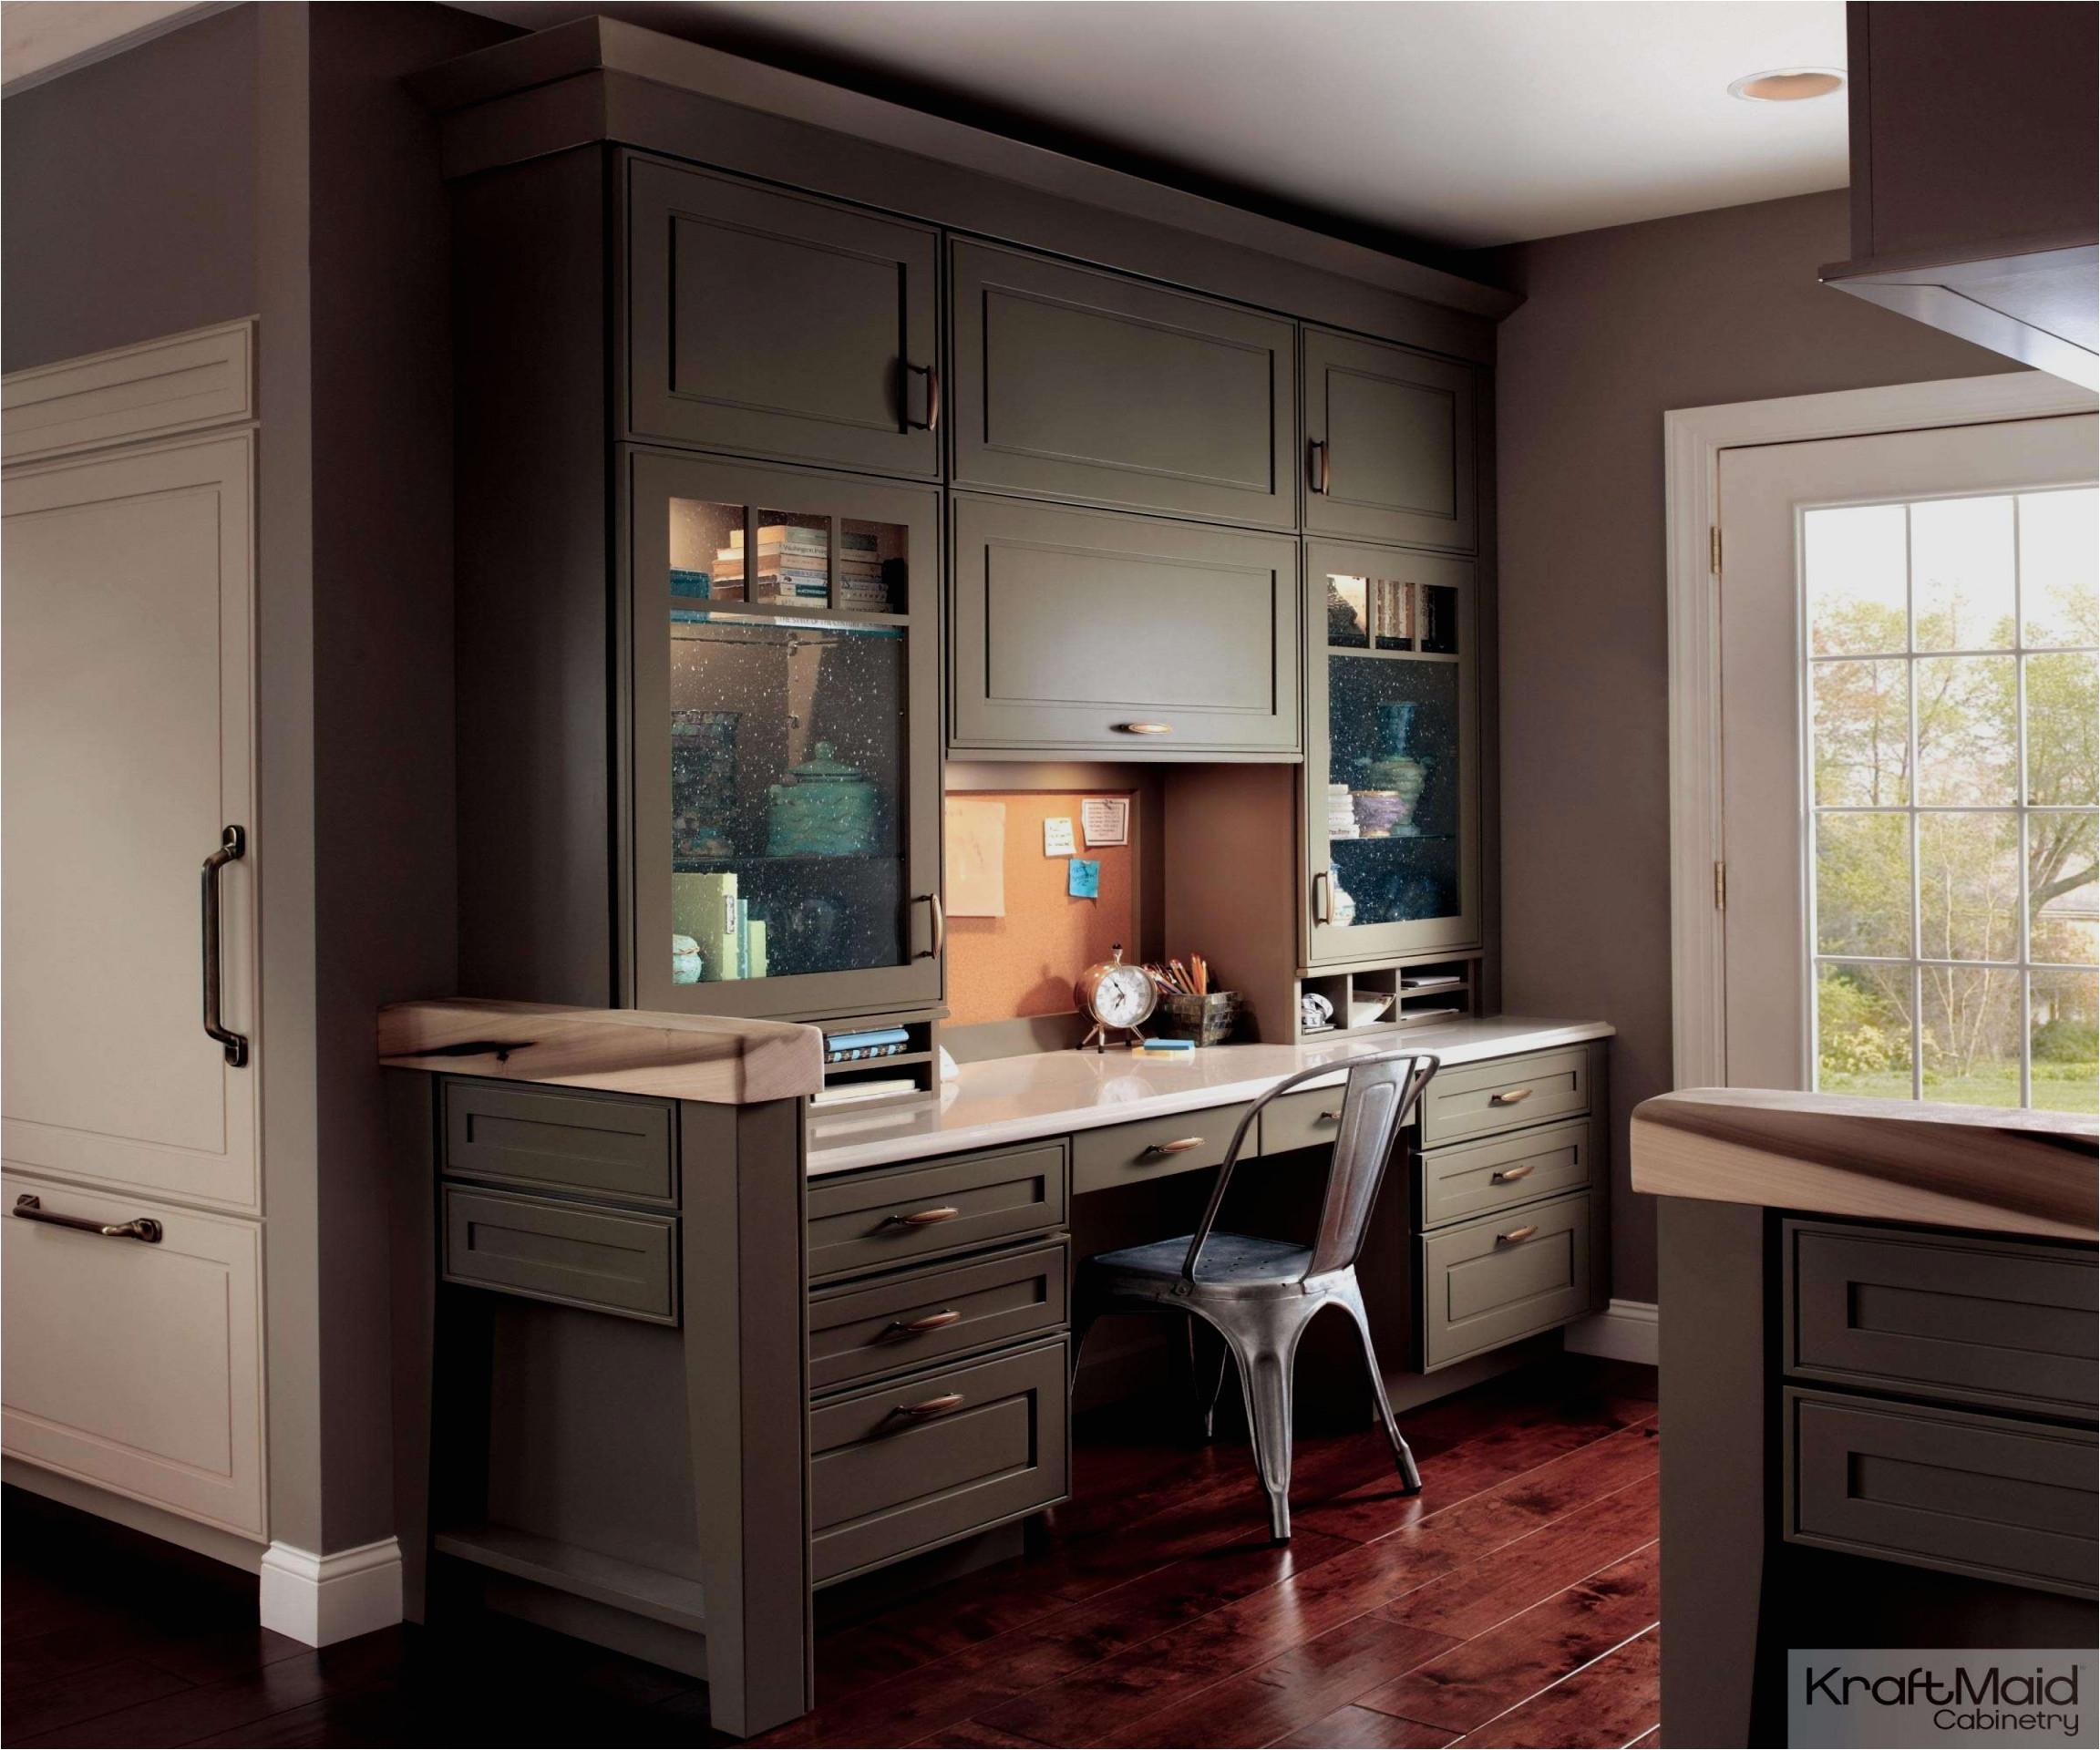 Outside Kitchen Cabinet Doors Inspirational Pickled Maple Kitchen Cabinets Awesome Kitchen Cabinet 0d Kitchen